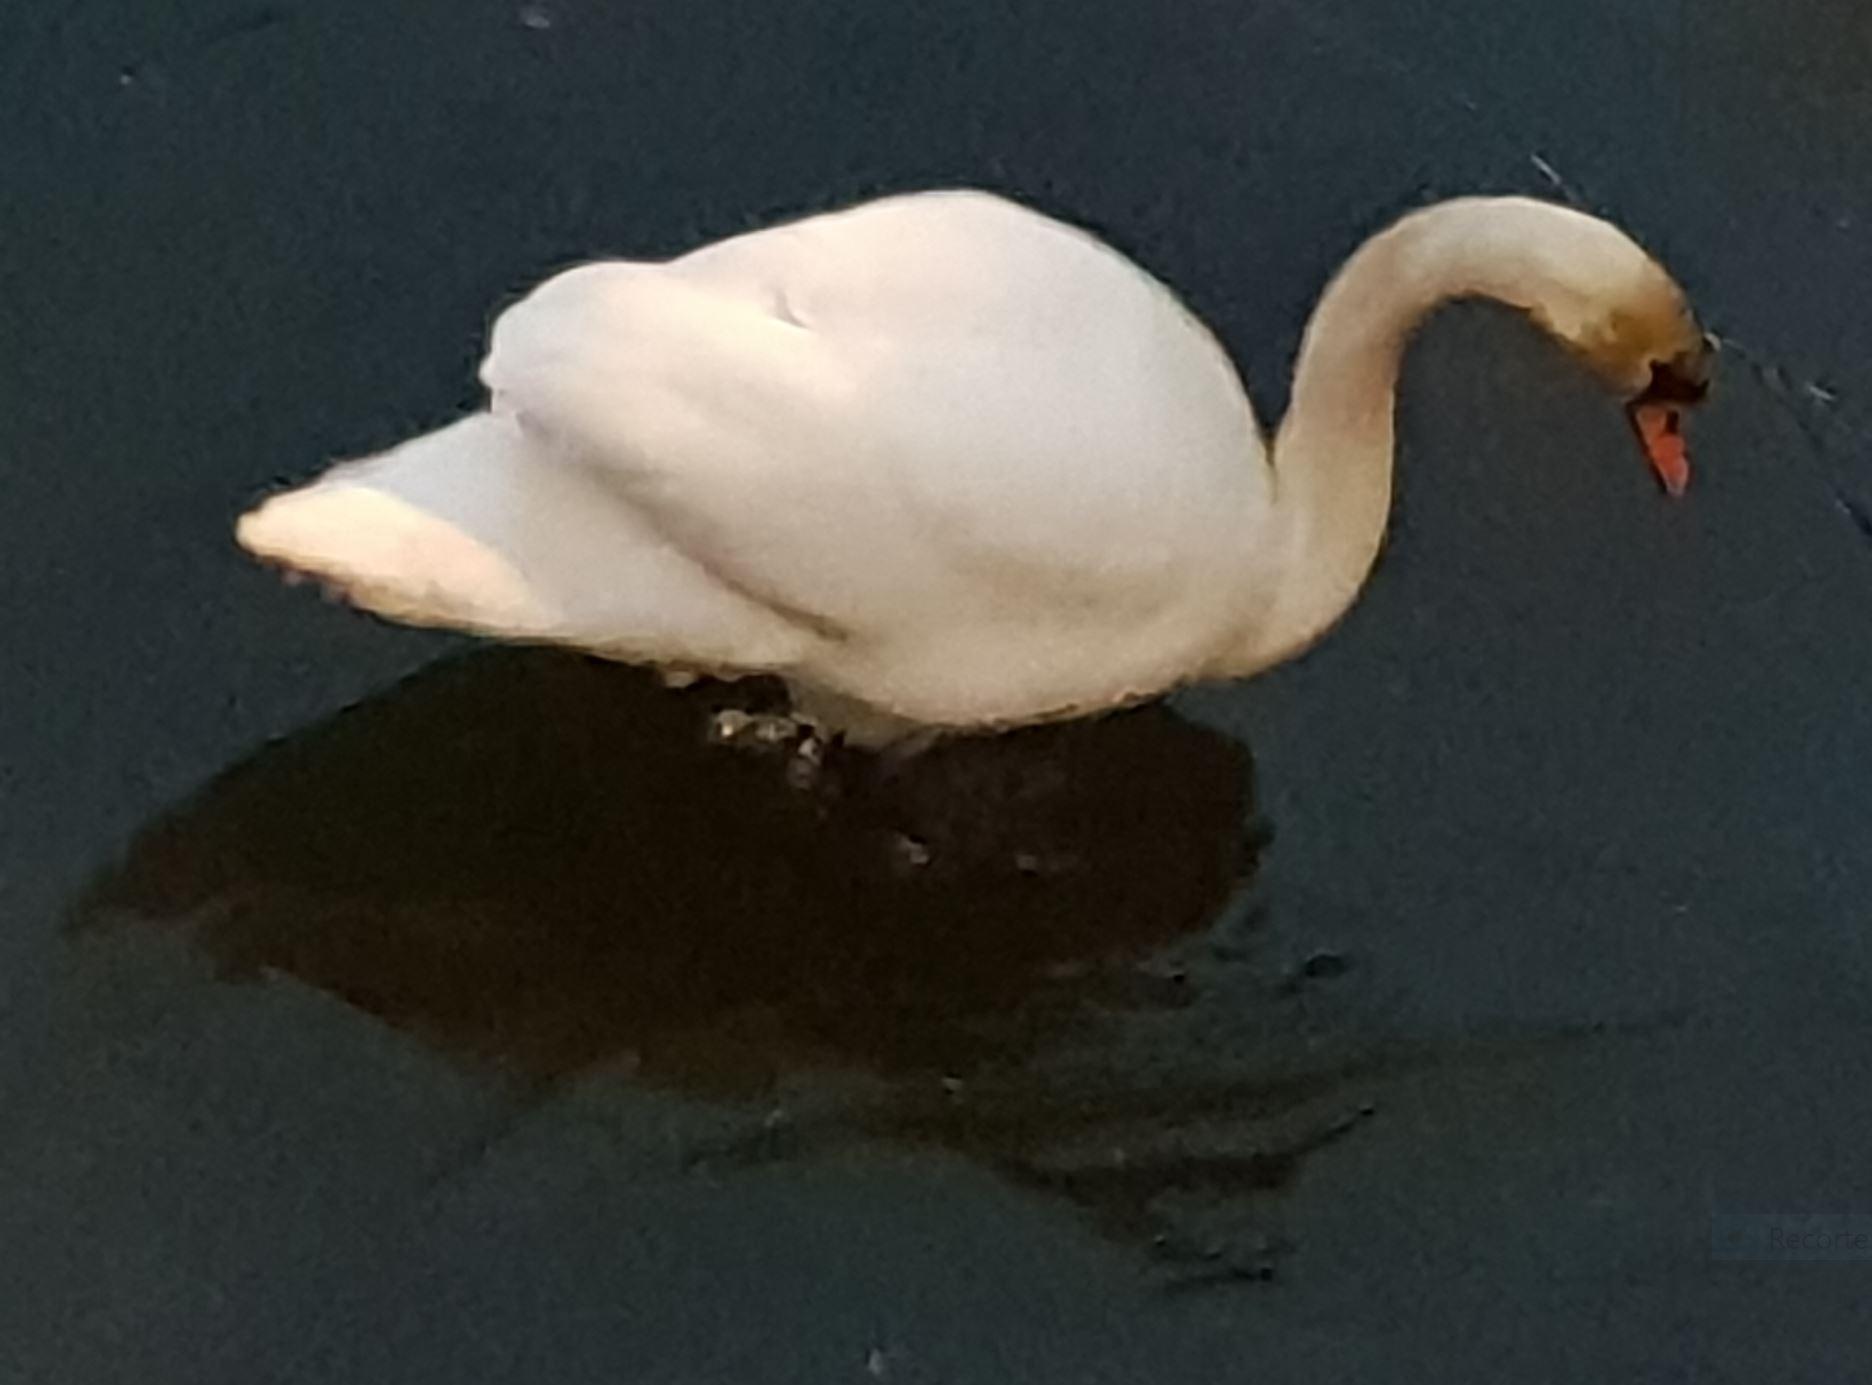 El cisne es cisne. Foto R.Puig